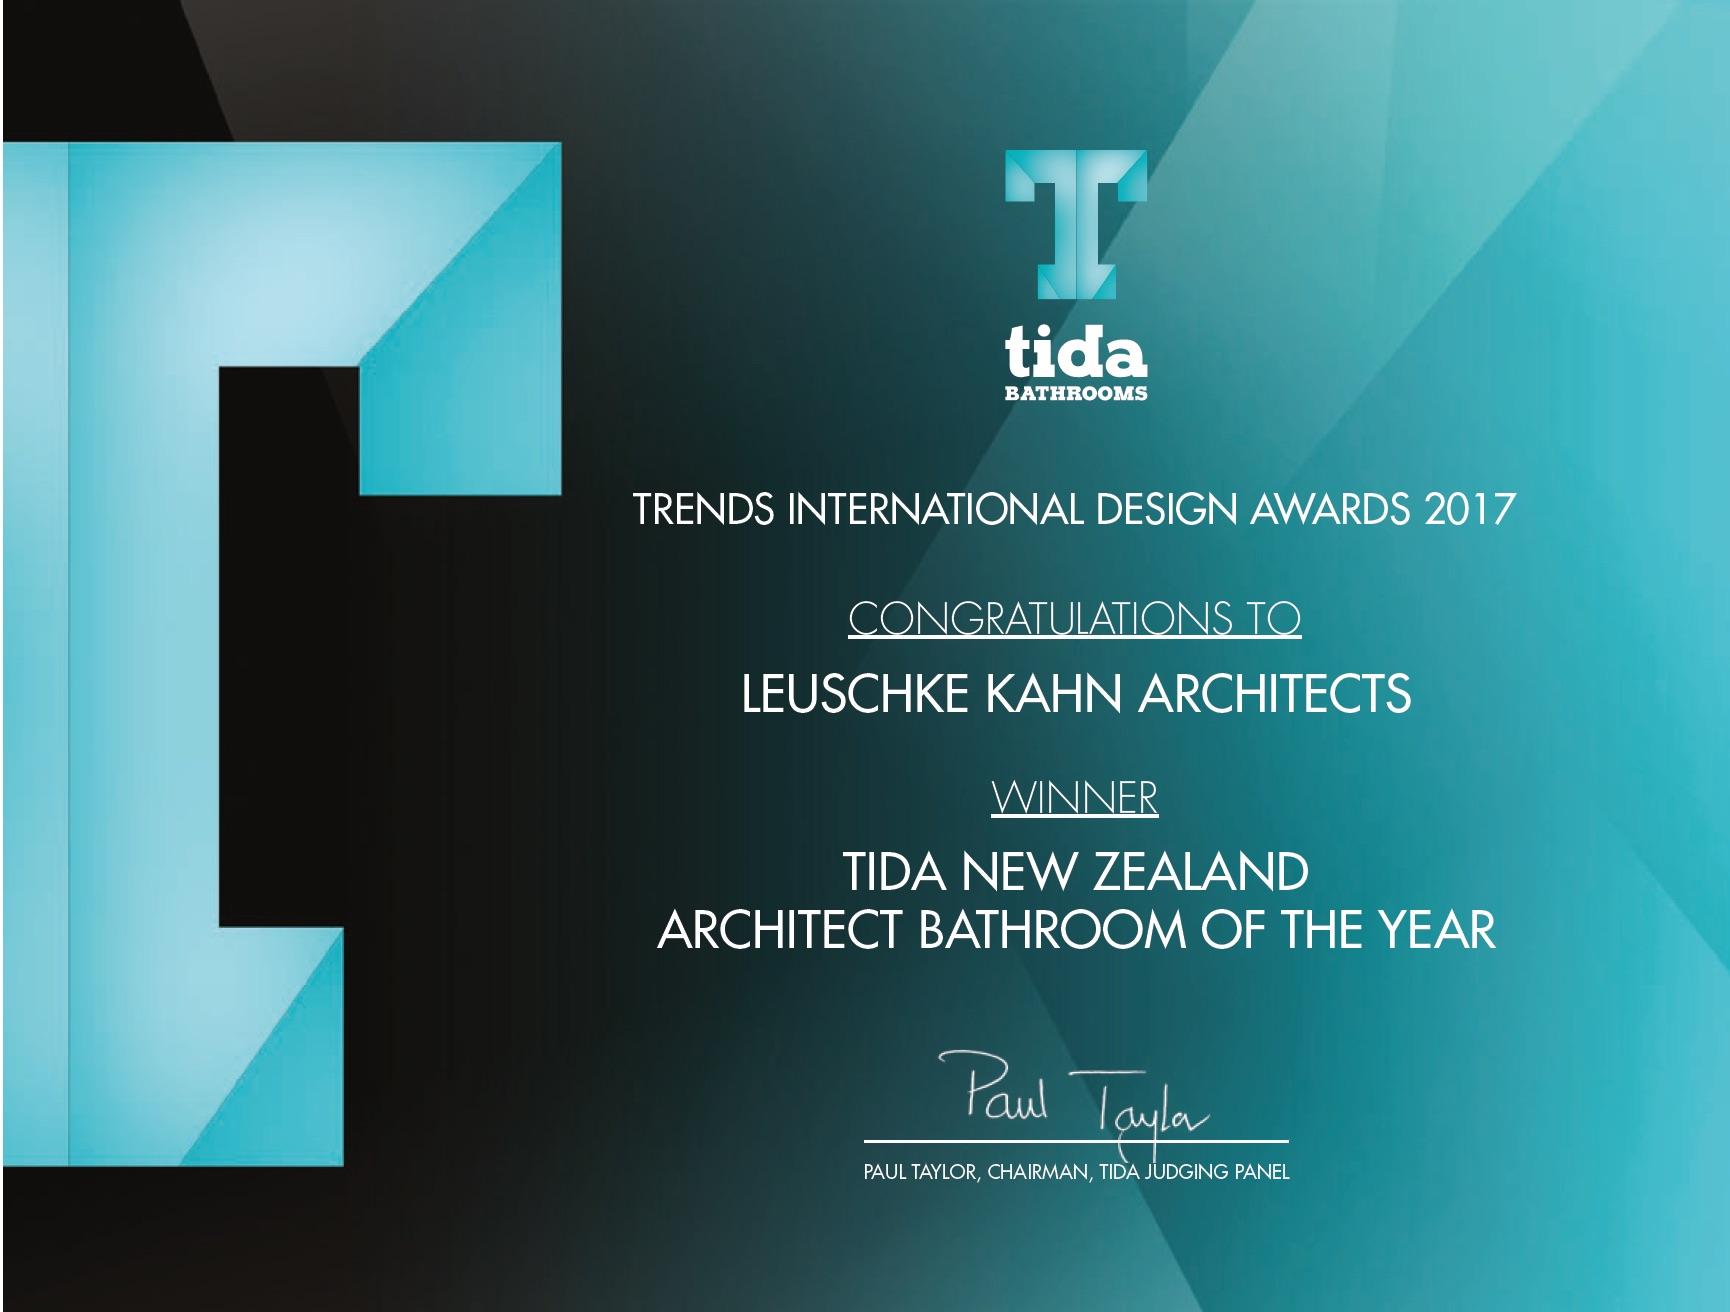 Architect Bathroom of the Year - TIDA Awards 2017